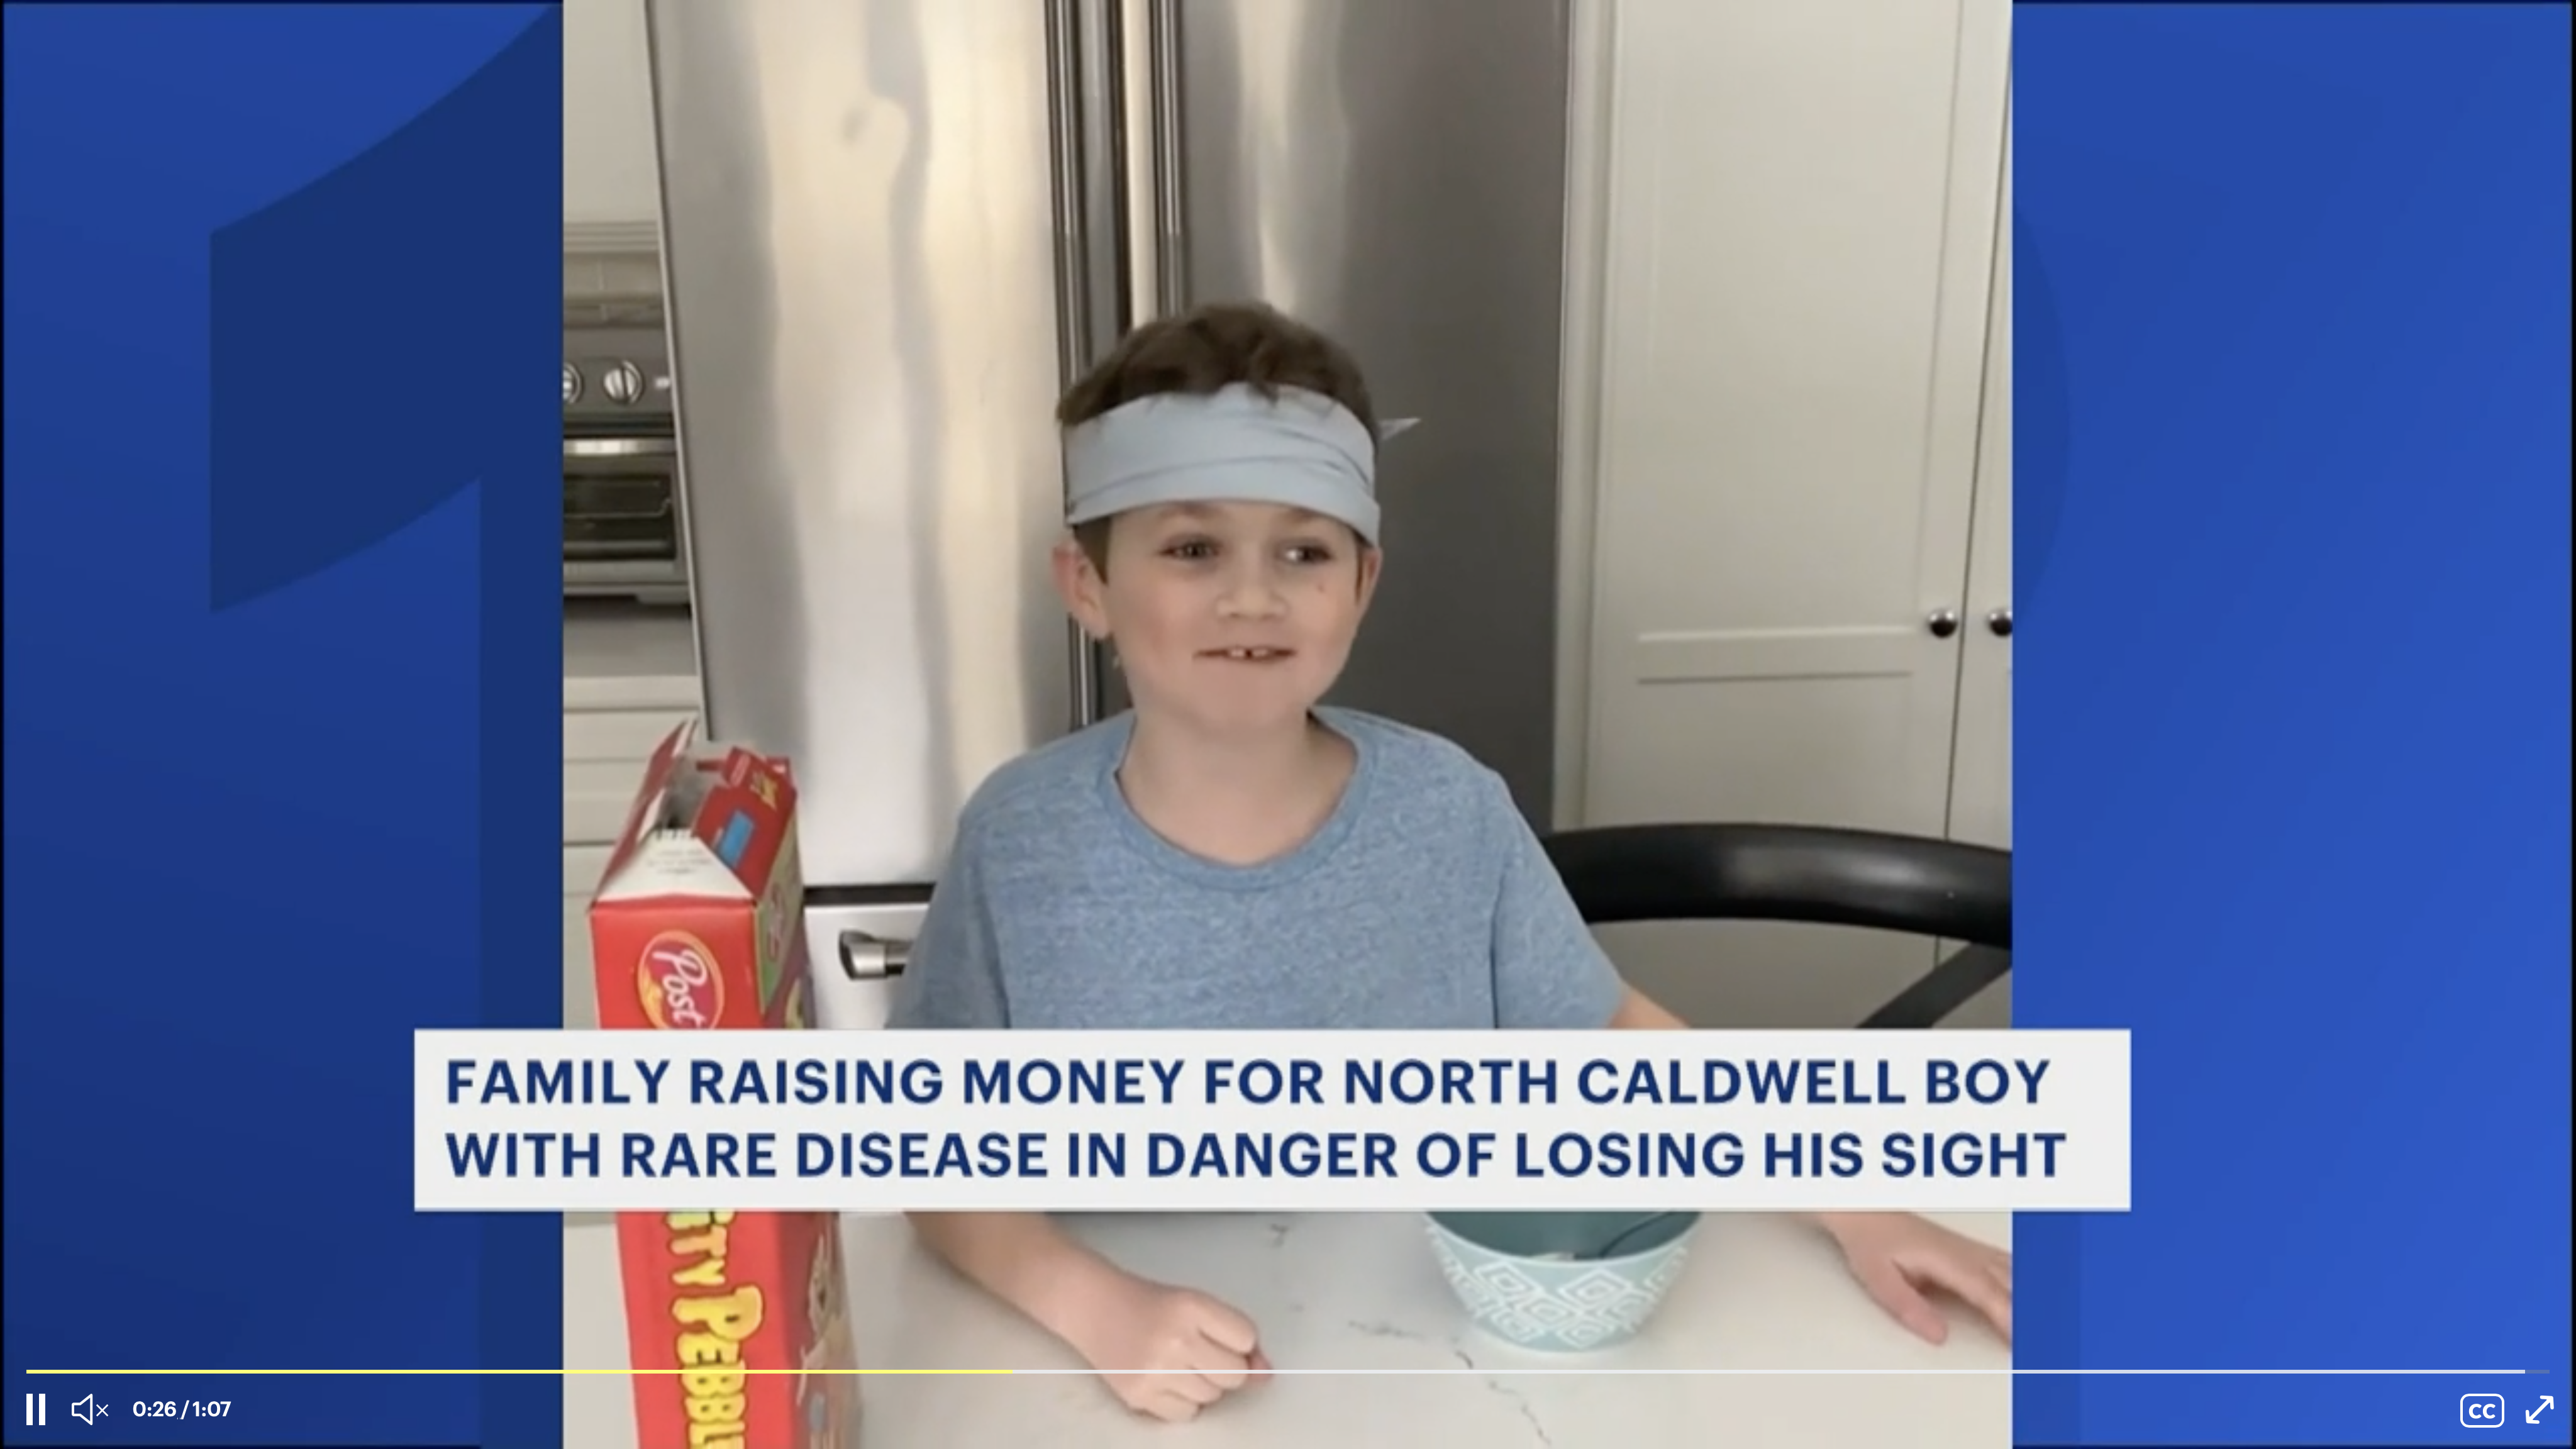 Challenge: Make a bowl of cereal - blindfolded. Family raising money for NJ boy in danger of losing sight